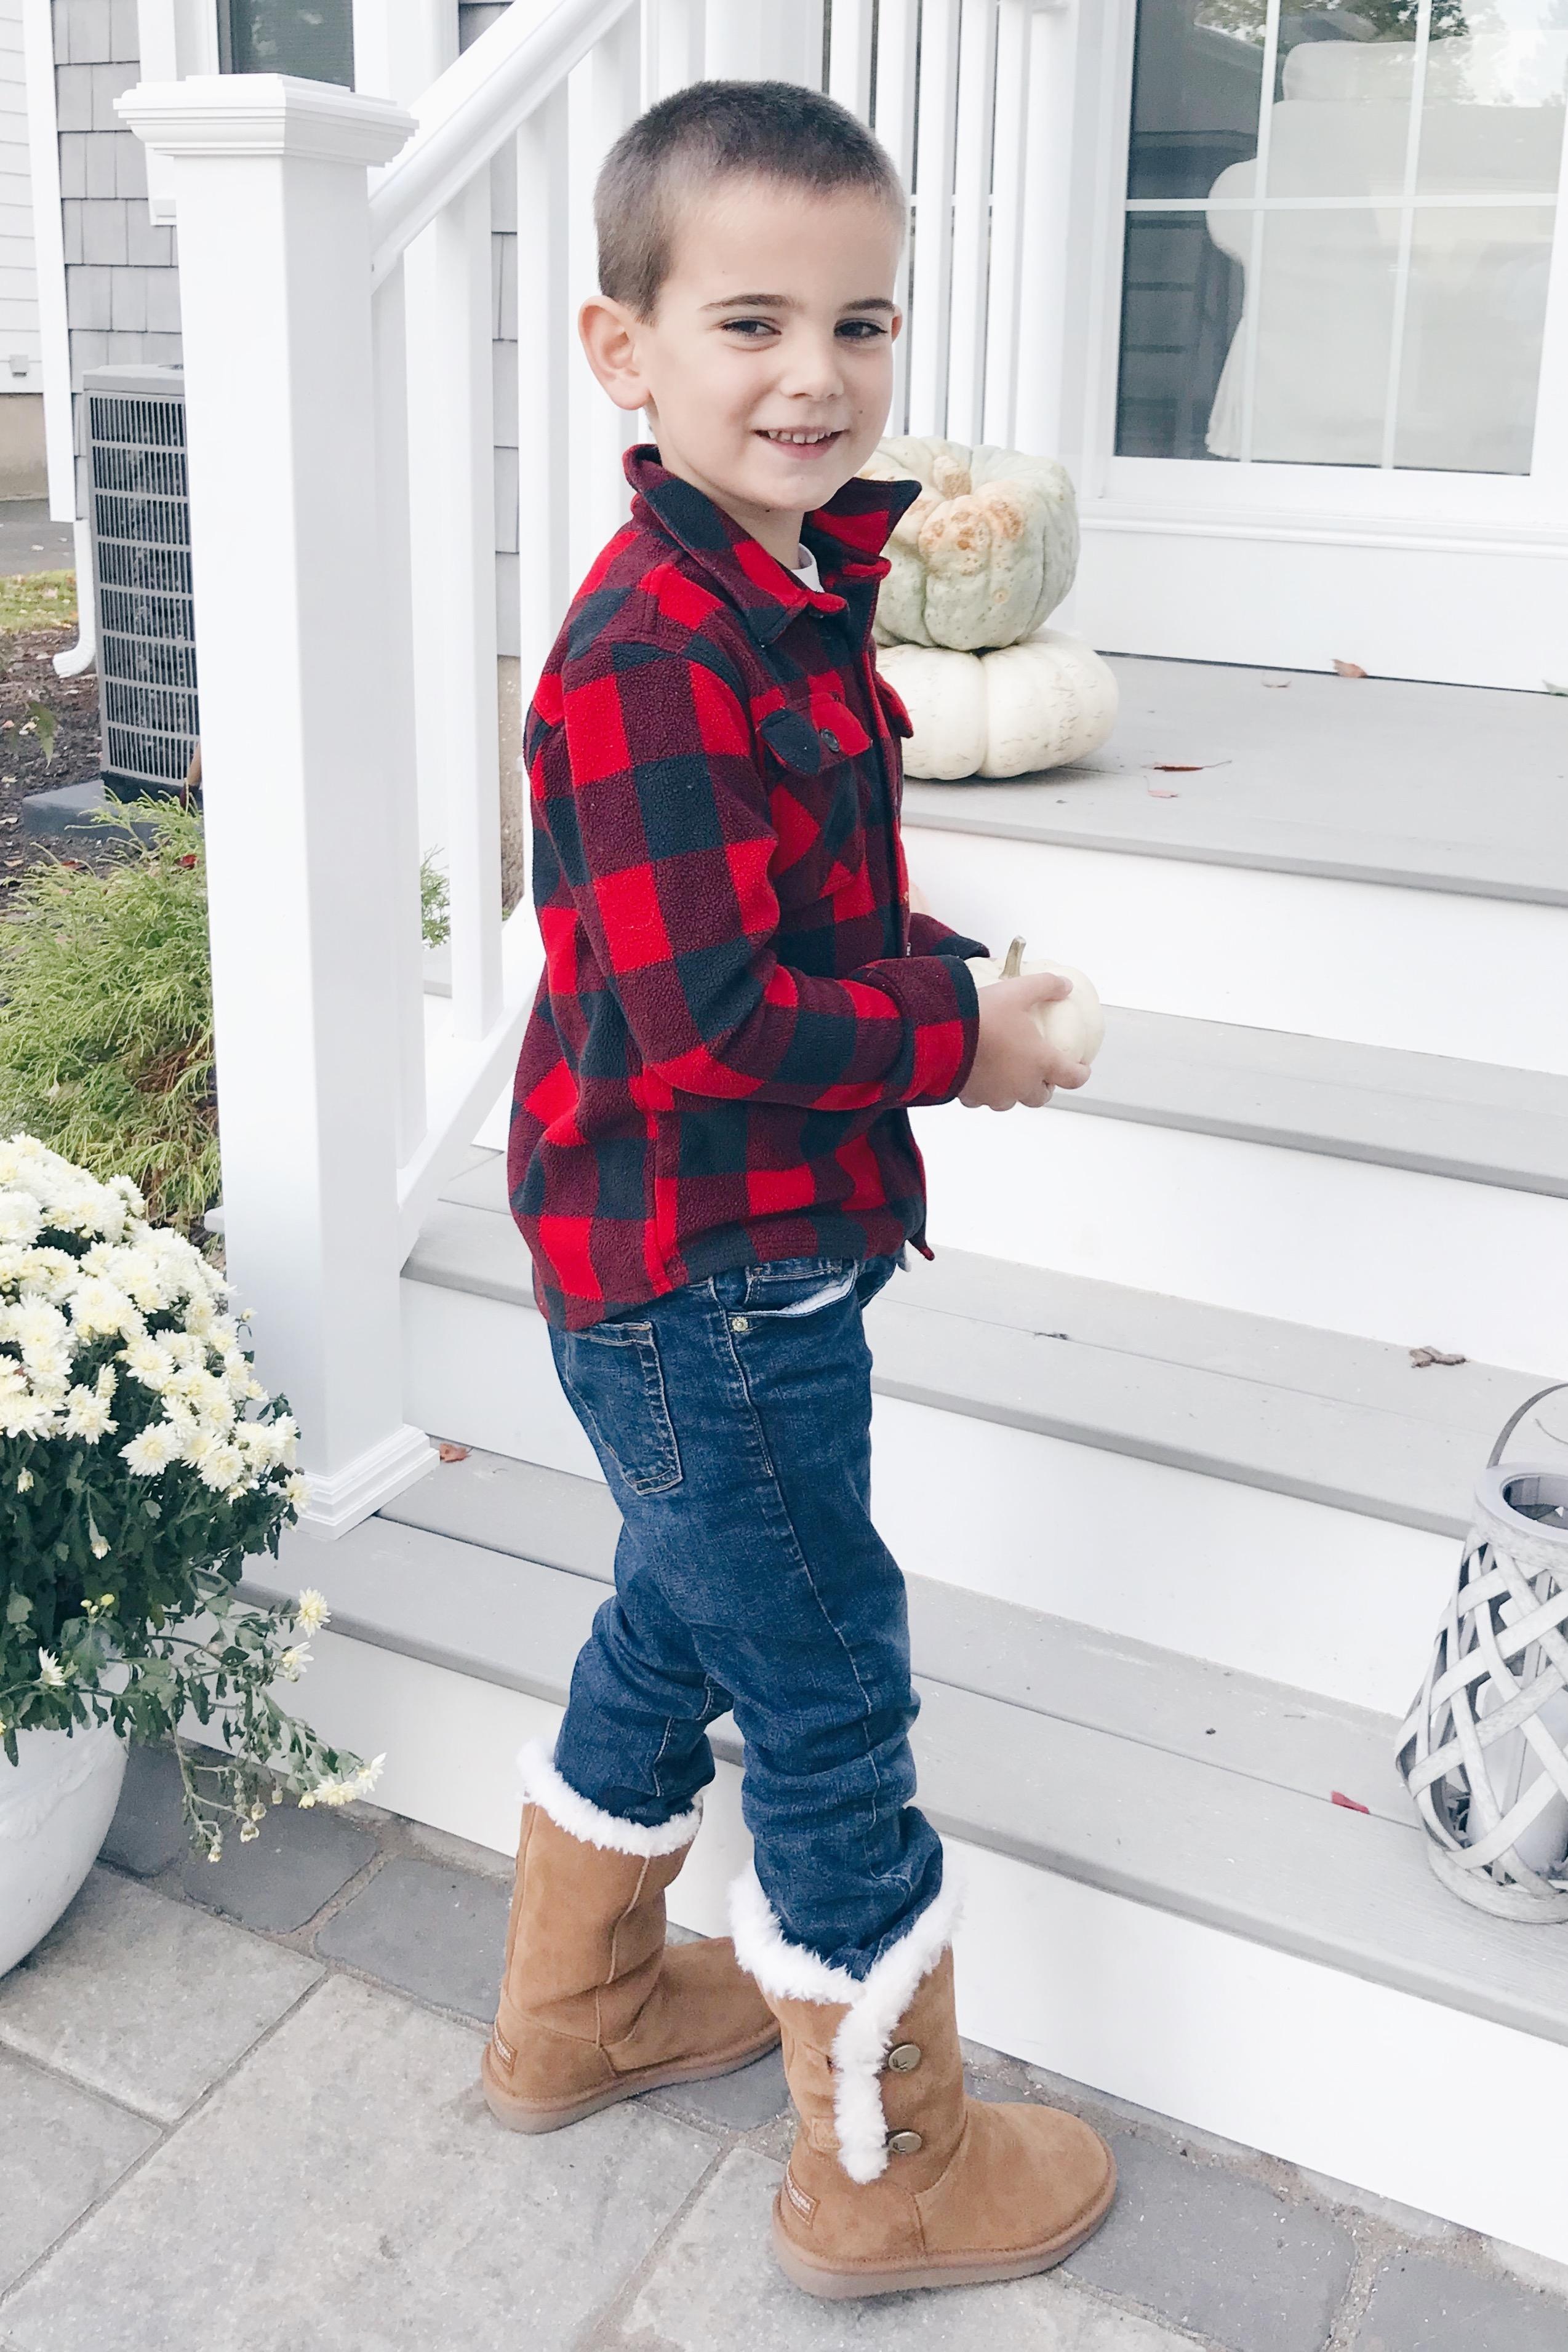 preschool boy decorating fall porch wearing kollaburra boots